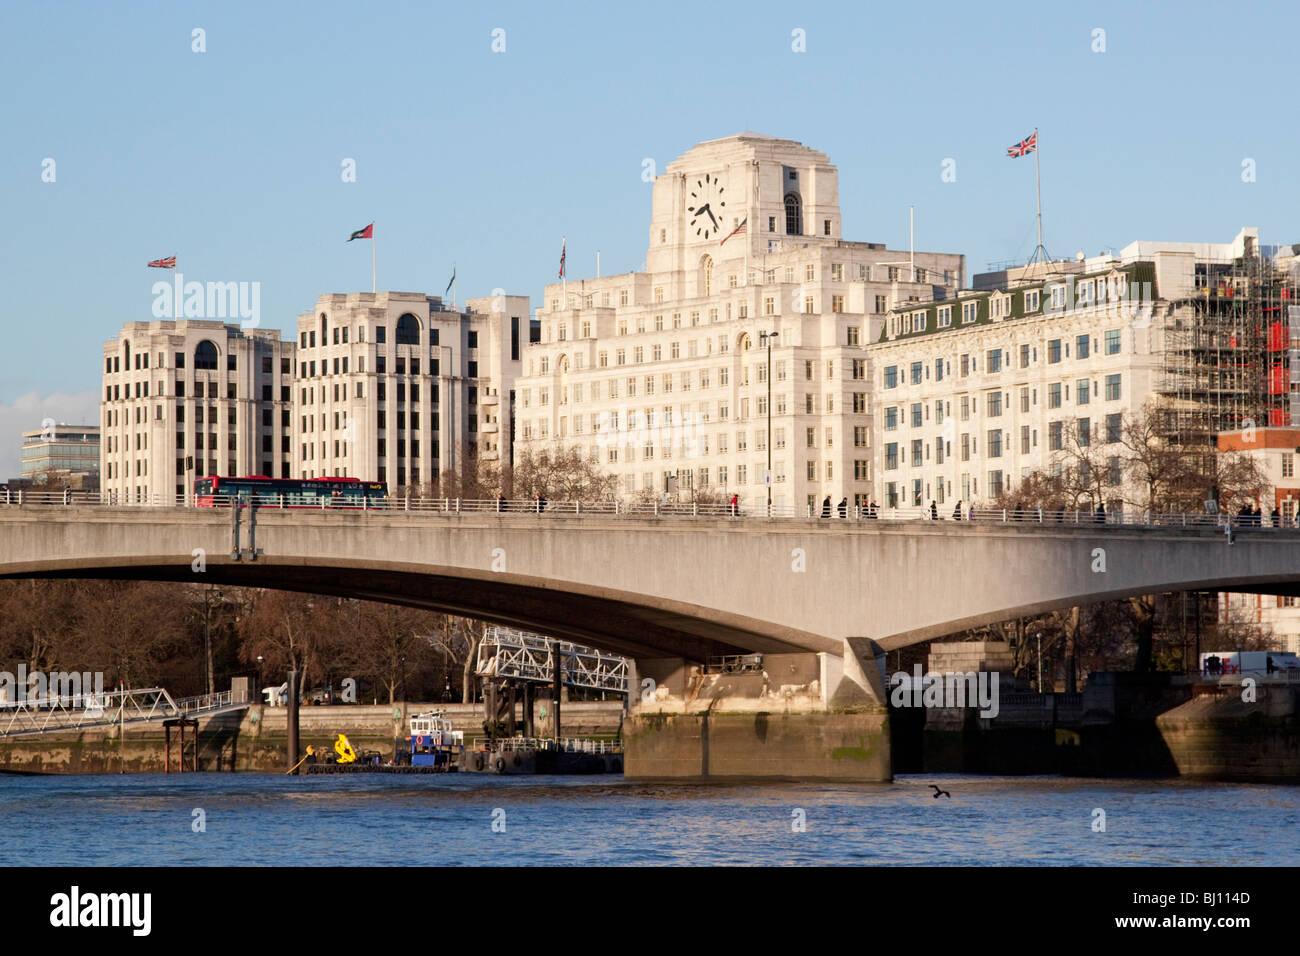 Waterloo Bridge et Shell Mex House et l'Hôtel Savoy Photo Stock